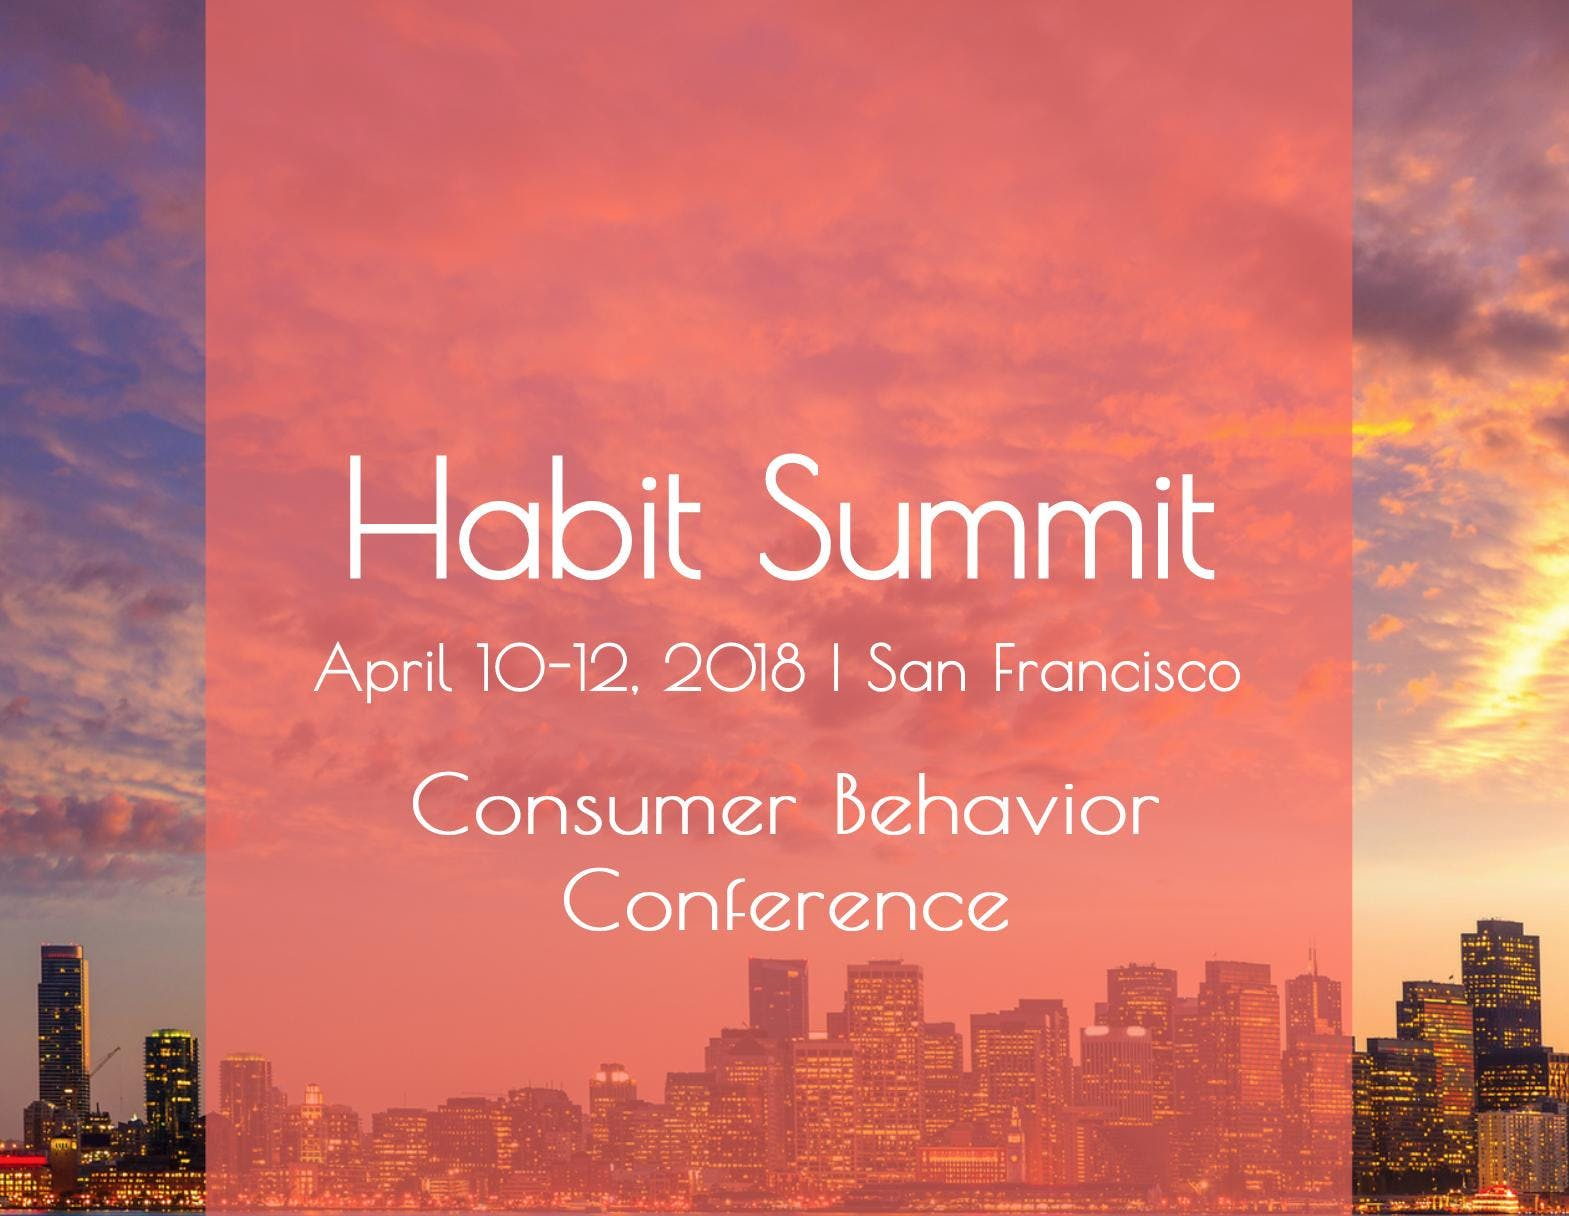 2018 Habit Summit Behavioral Design Conference: Video Access